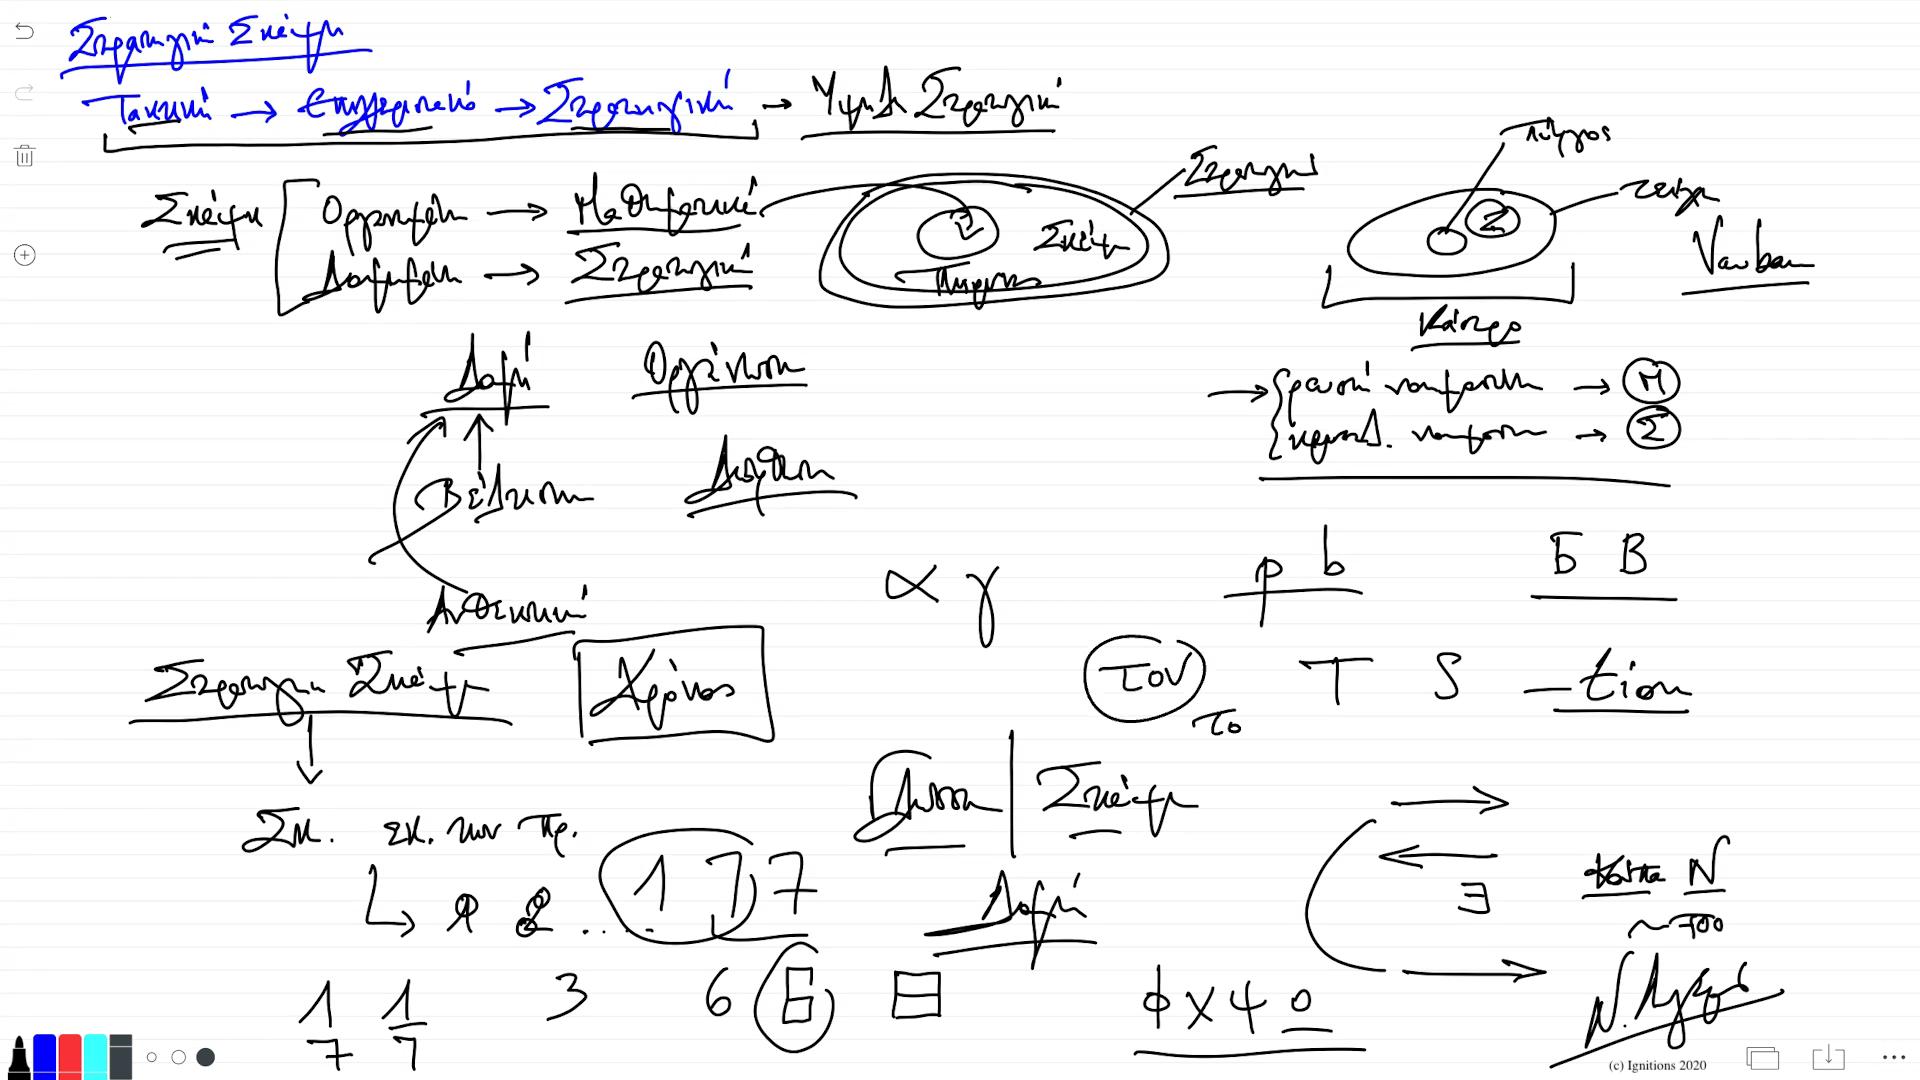 56101 - e-Μάθημα: Στρατηγική σκέψη και εφαρμογές. (Dessin)